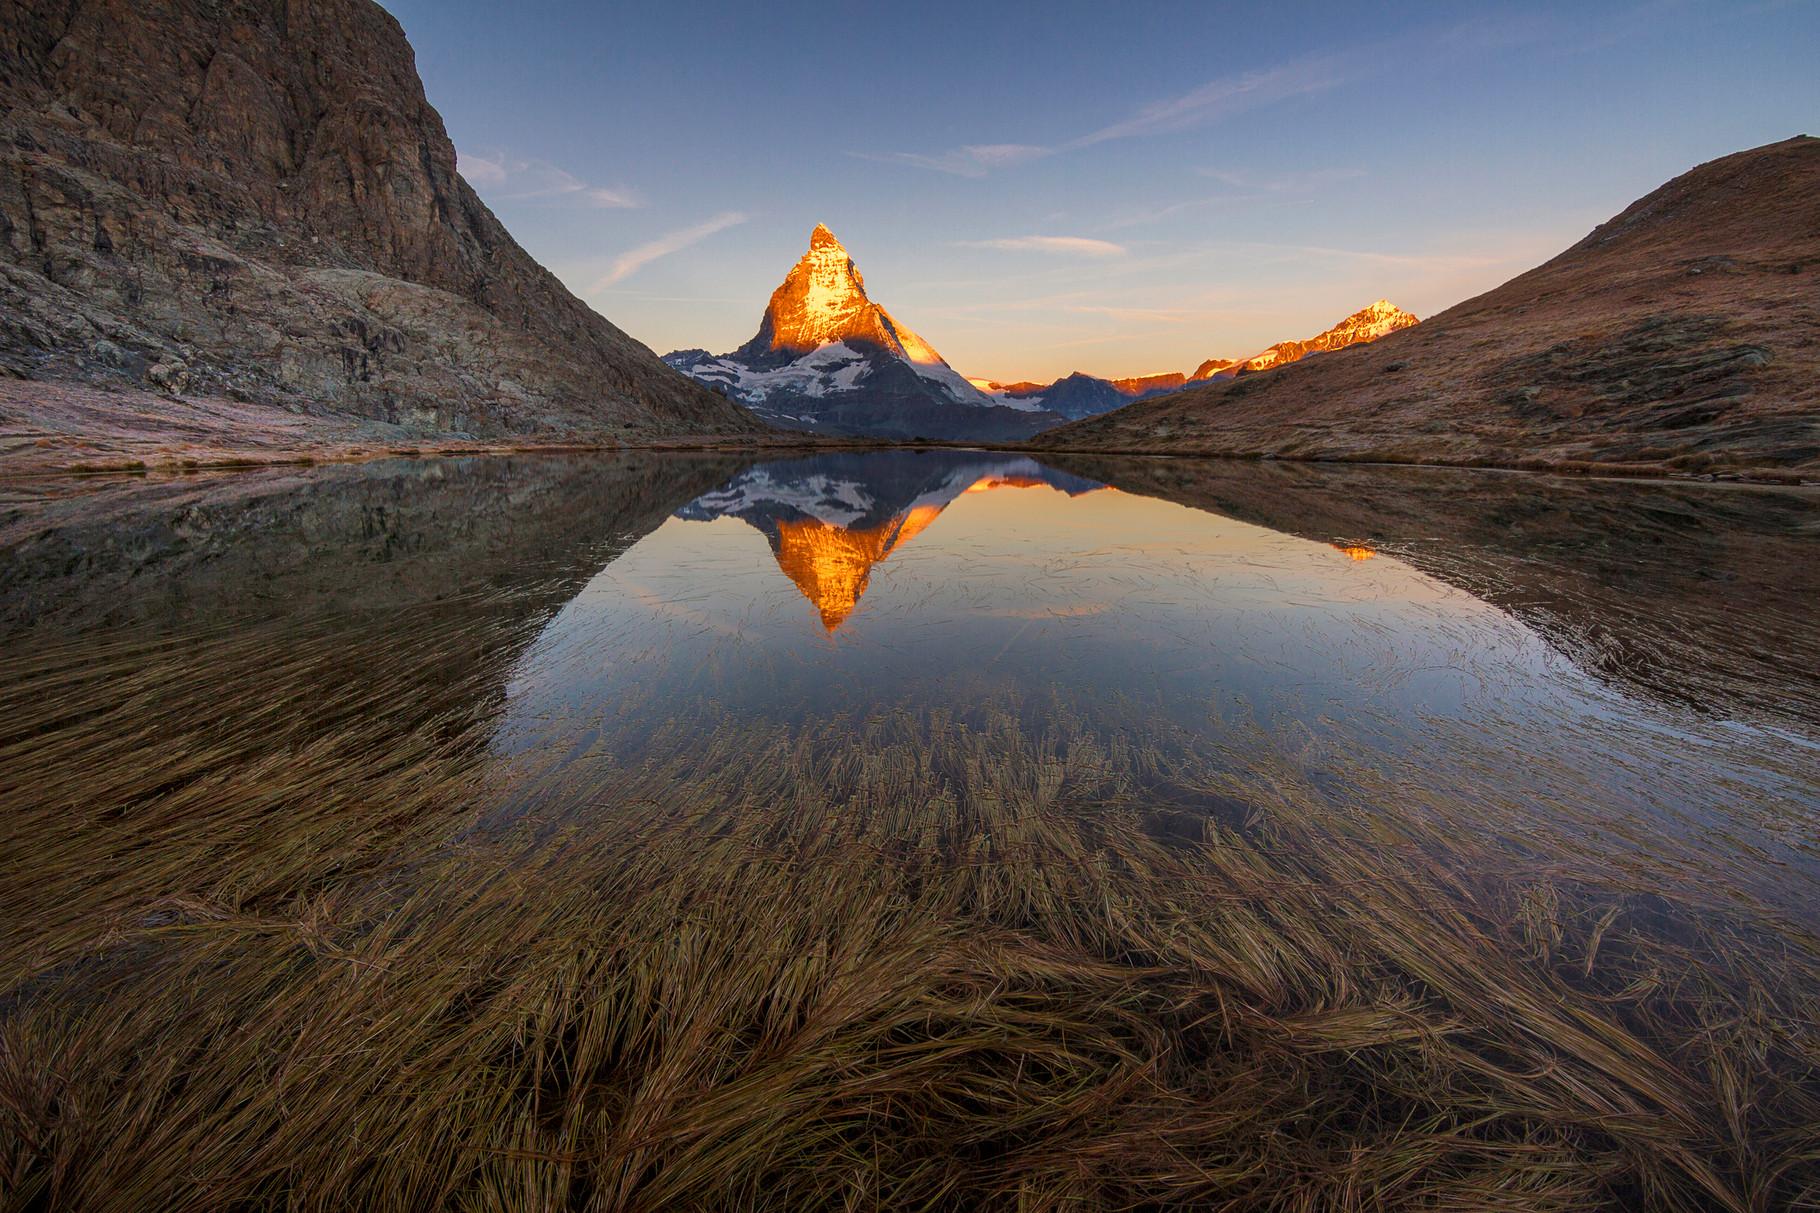 D-Gold CPSz-Lazar Ioan Ovidiu (RO)-Hot Peak/ Varful incins